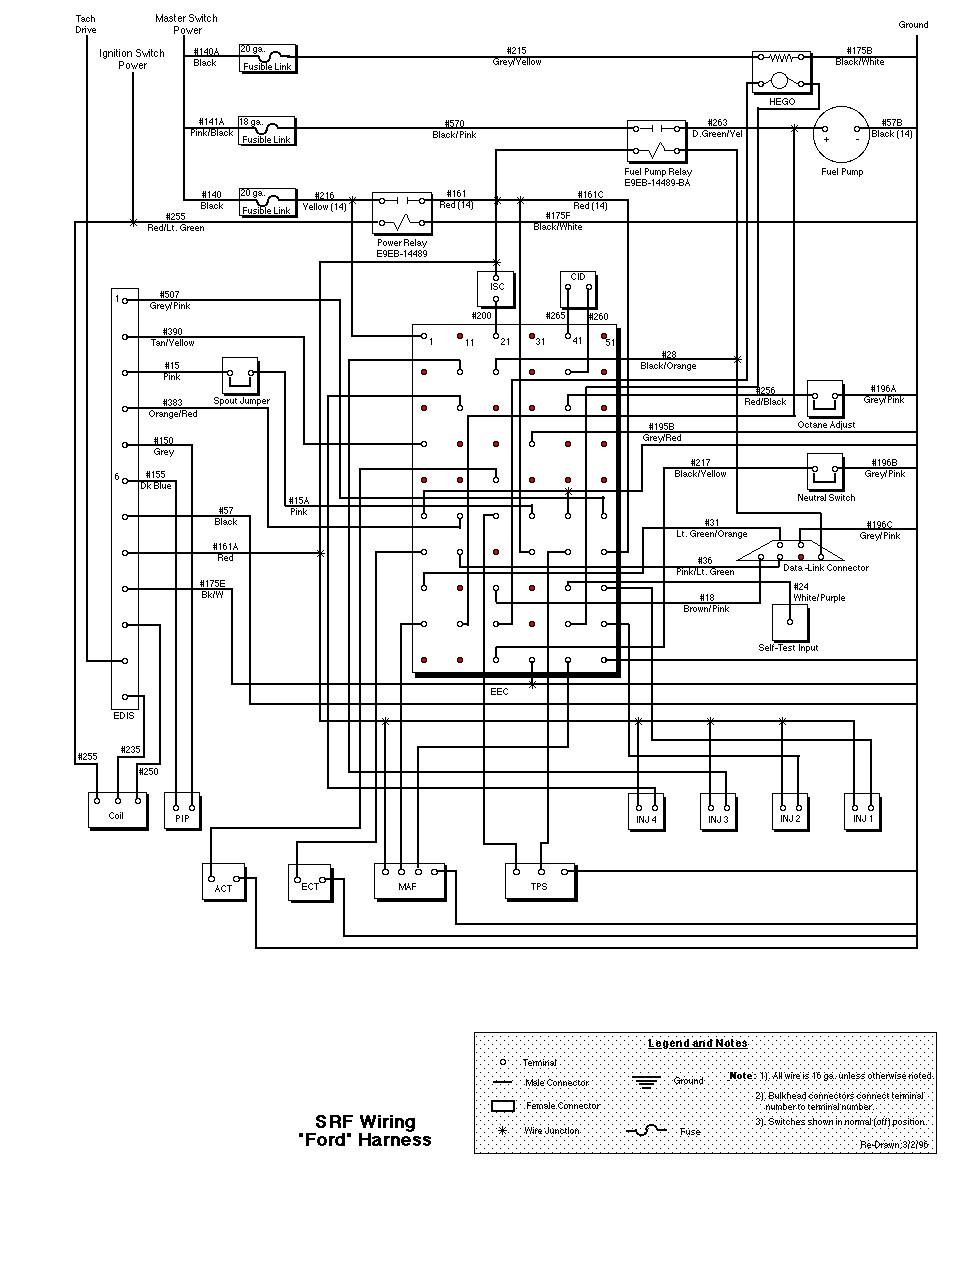 40CR 4401] Free Ford L40 Series Wiring Schematic   ground ...